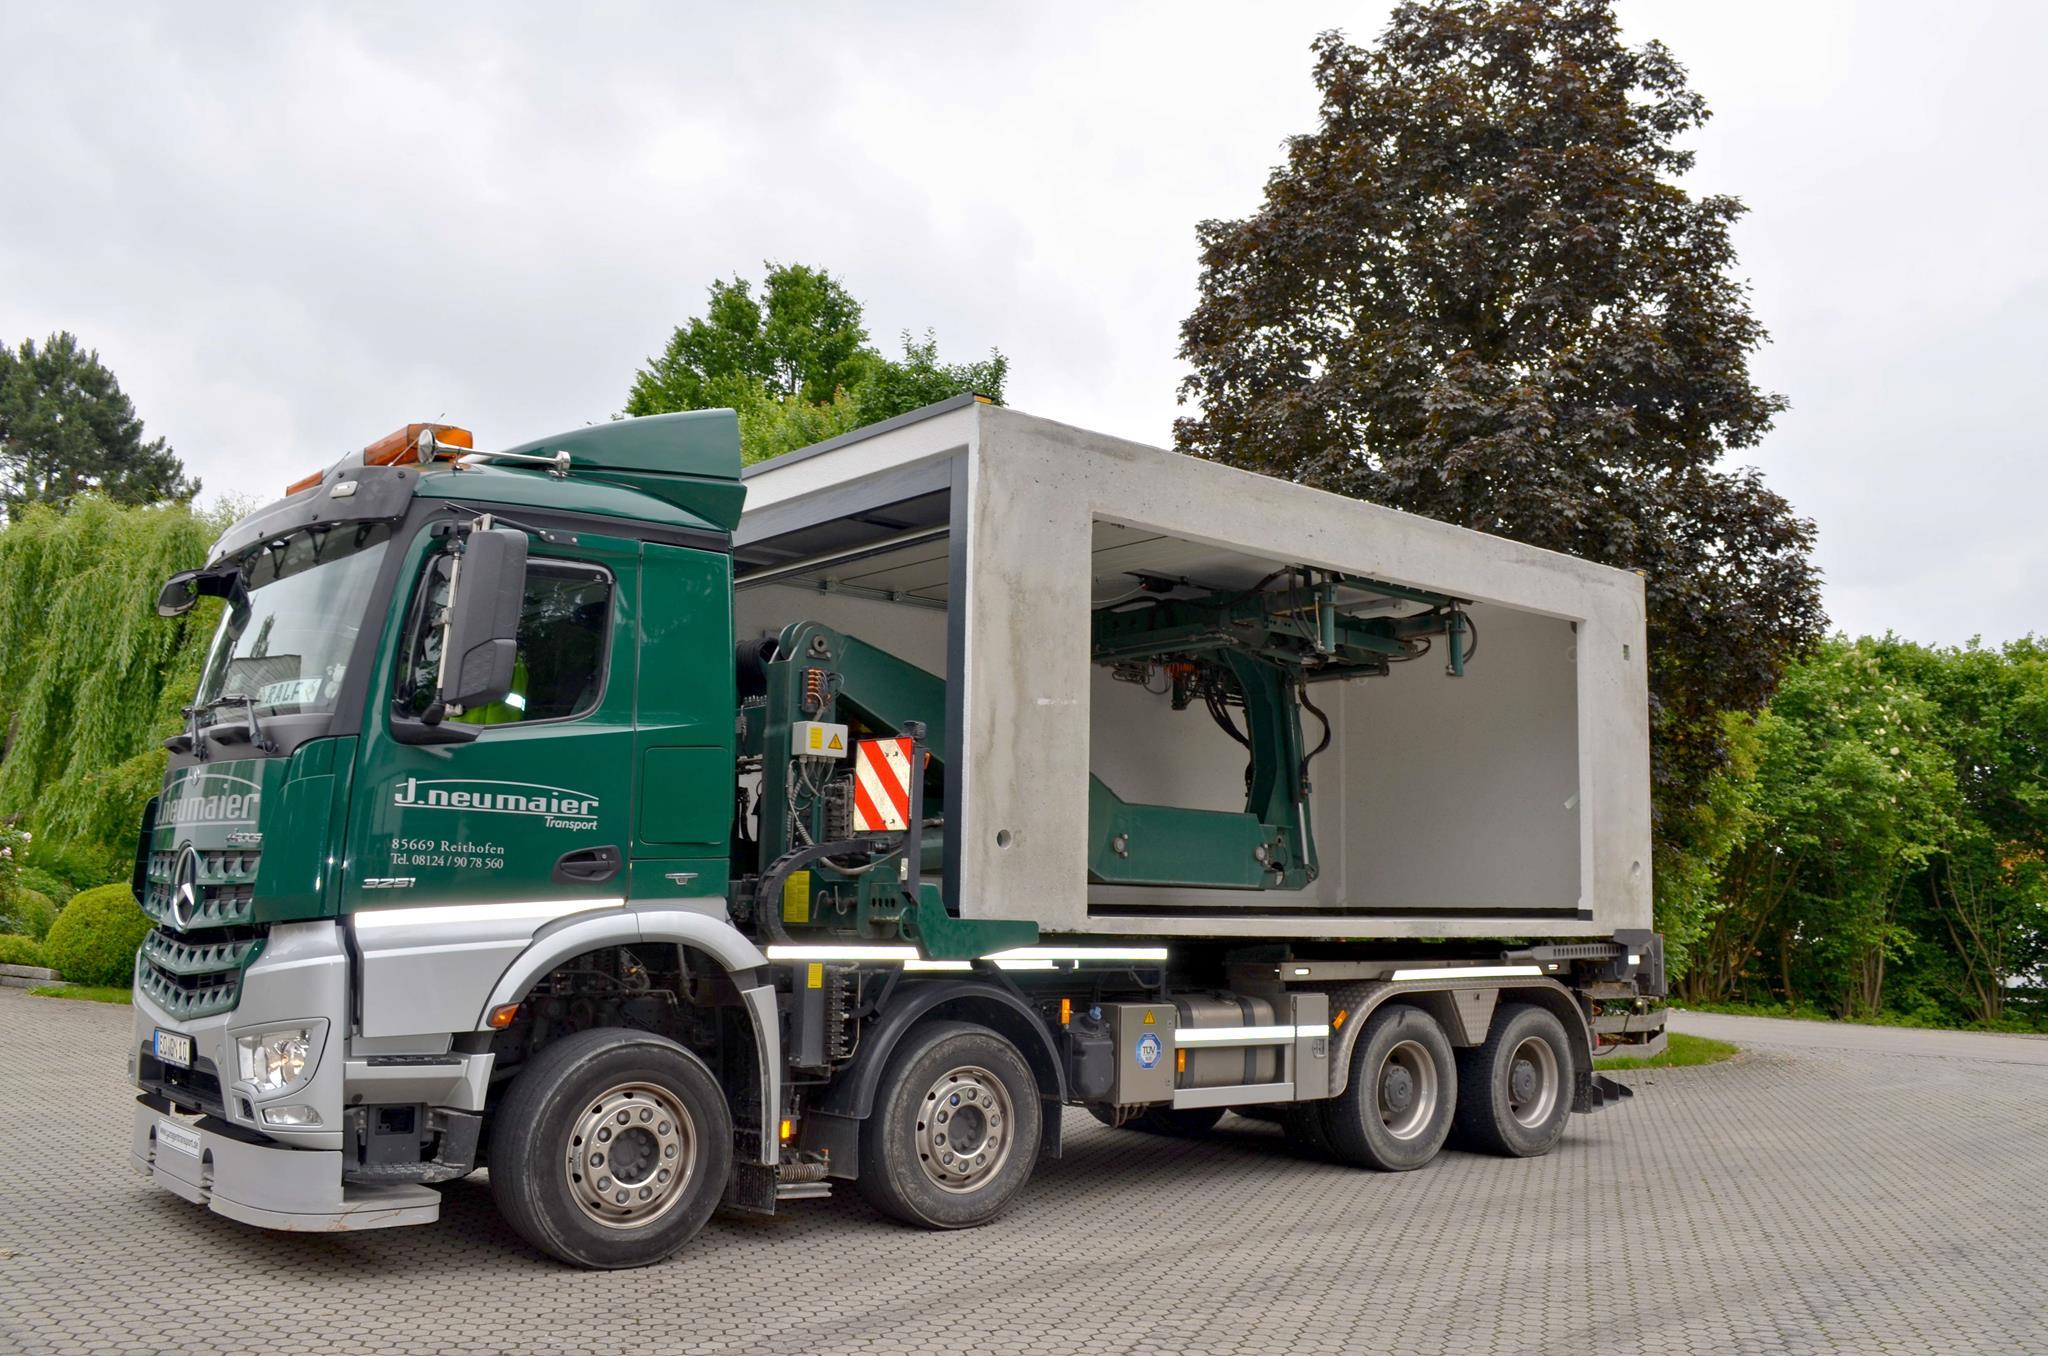 garagentransport gmbh neumaier transport gmbh lindacher weg 6 85669 reithofen. Black Bedroom Furniture Sets. Home Design Ideas